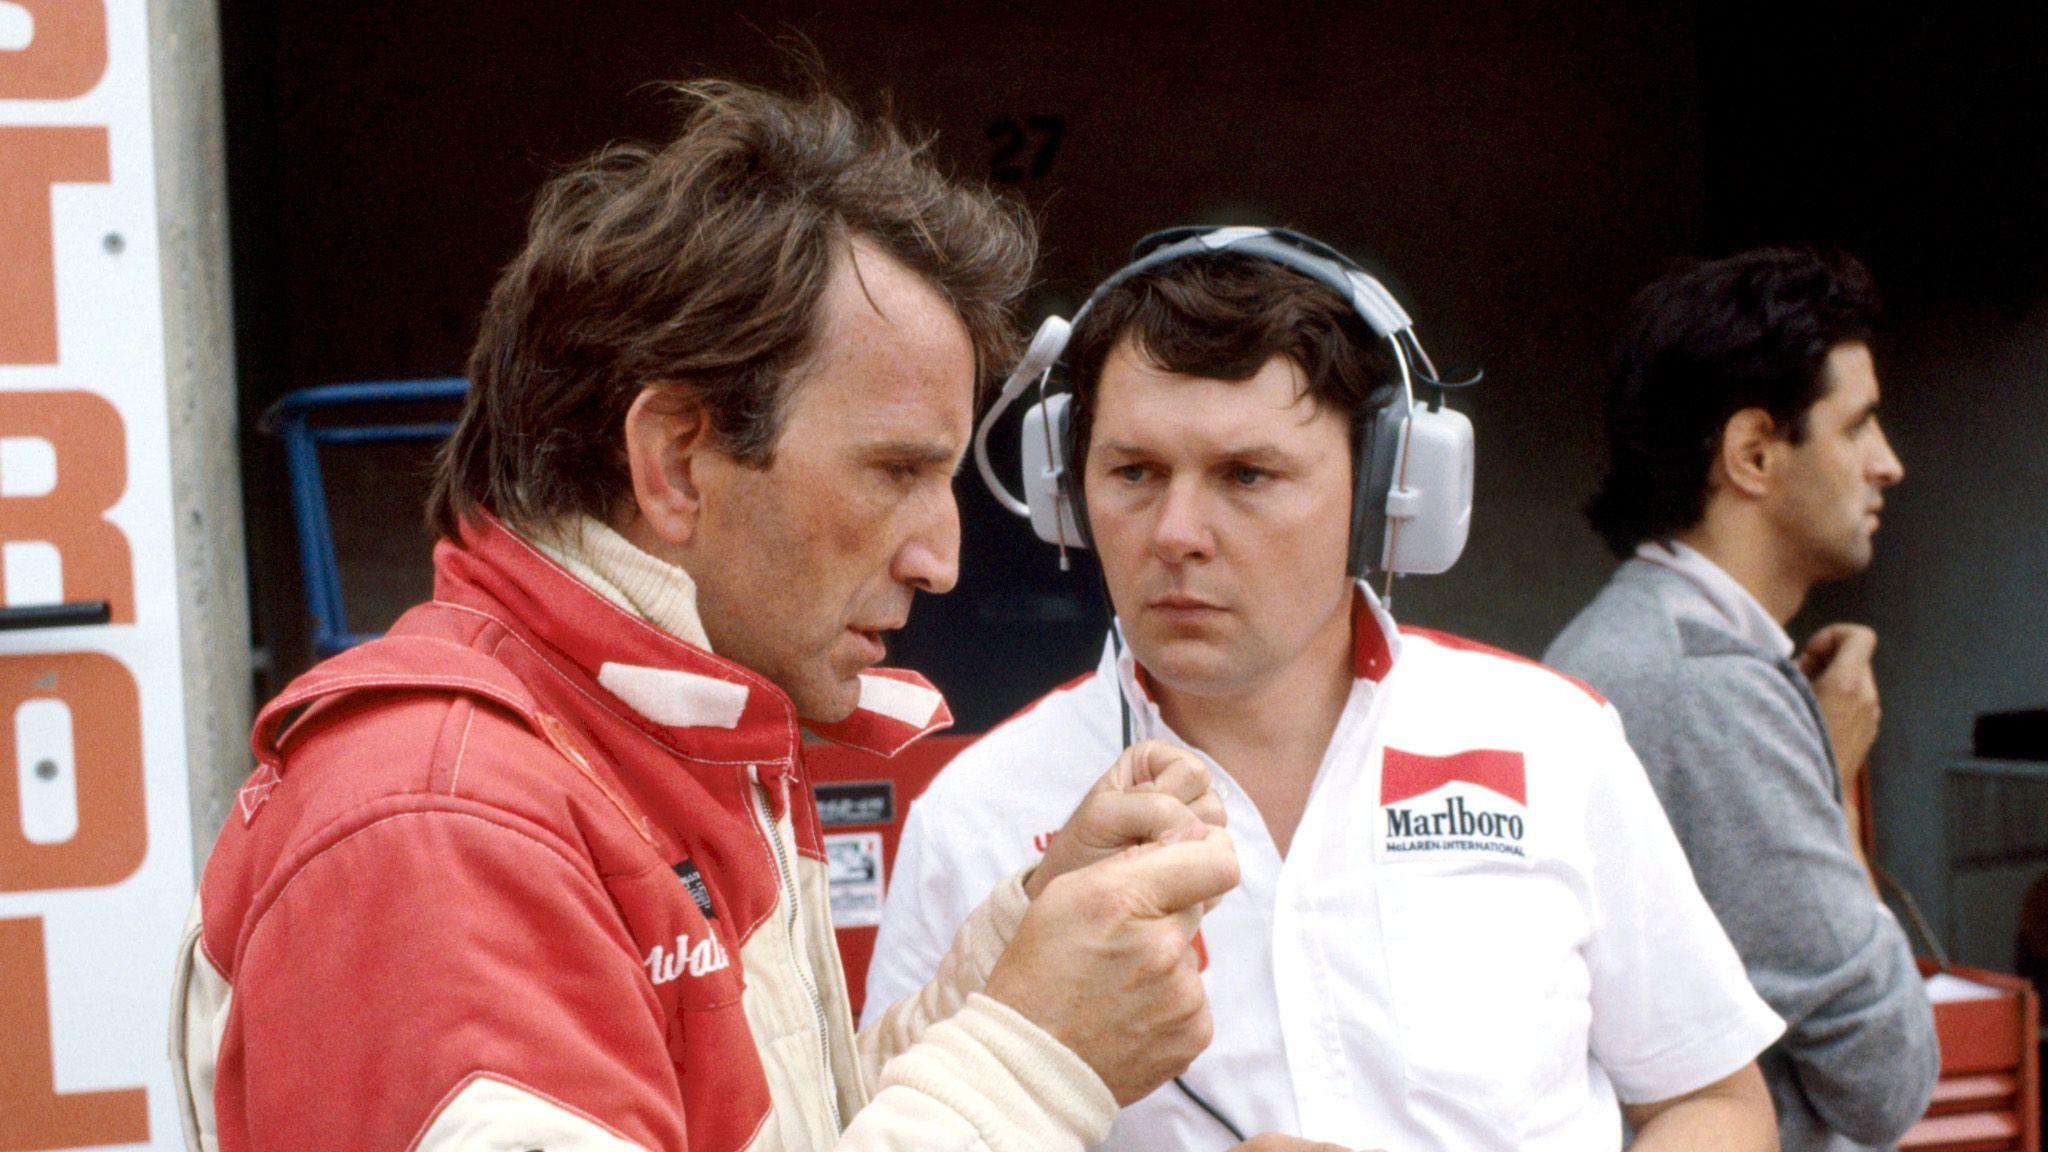 John Barnard, F1, Beyond The Grid